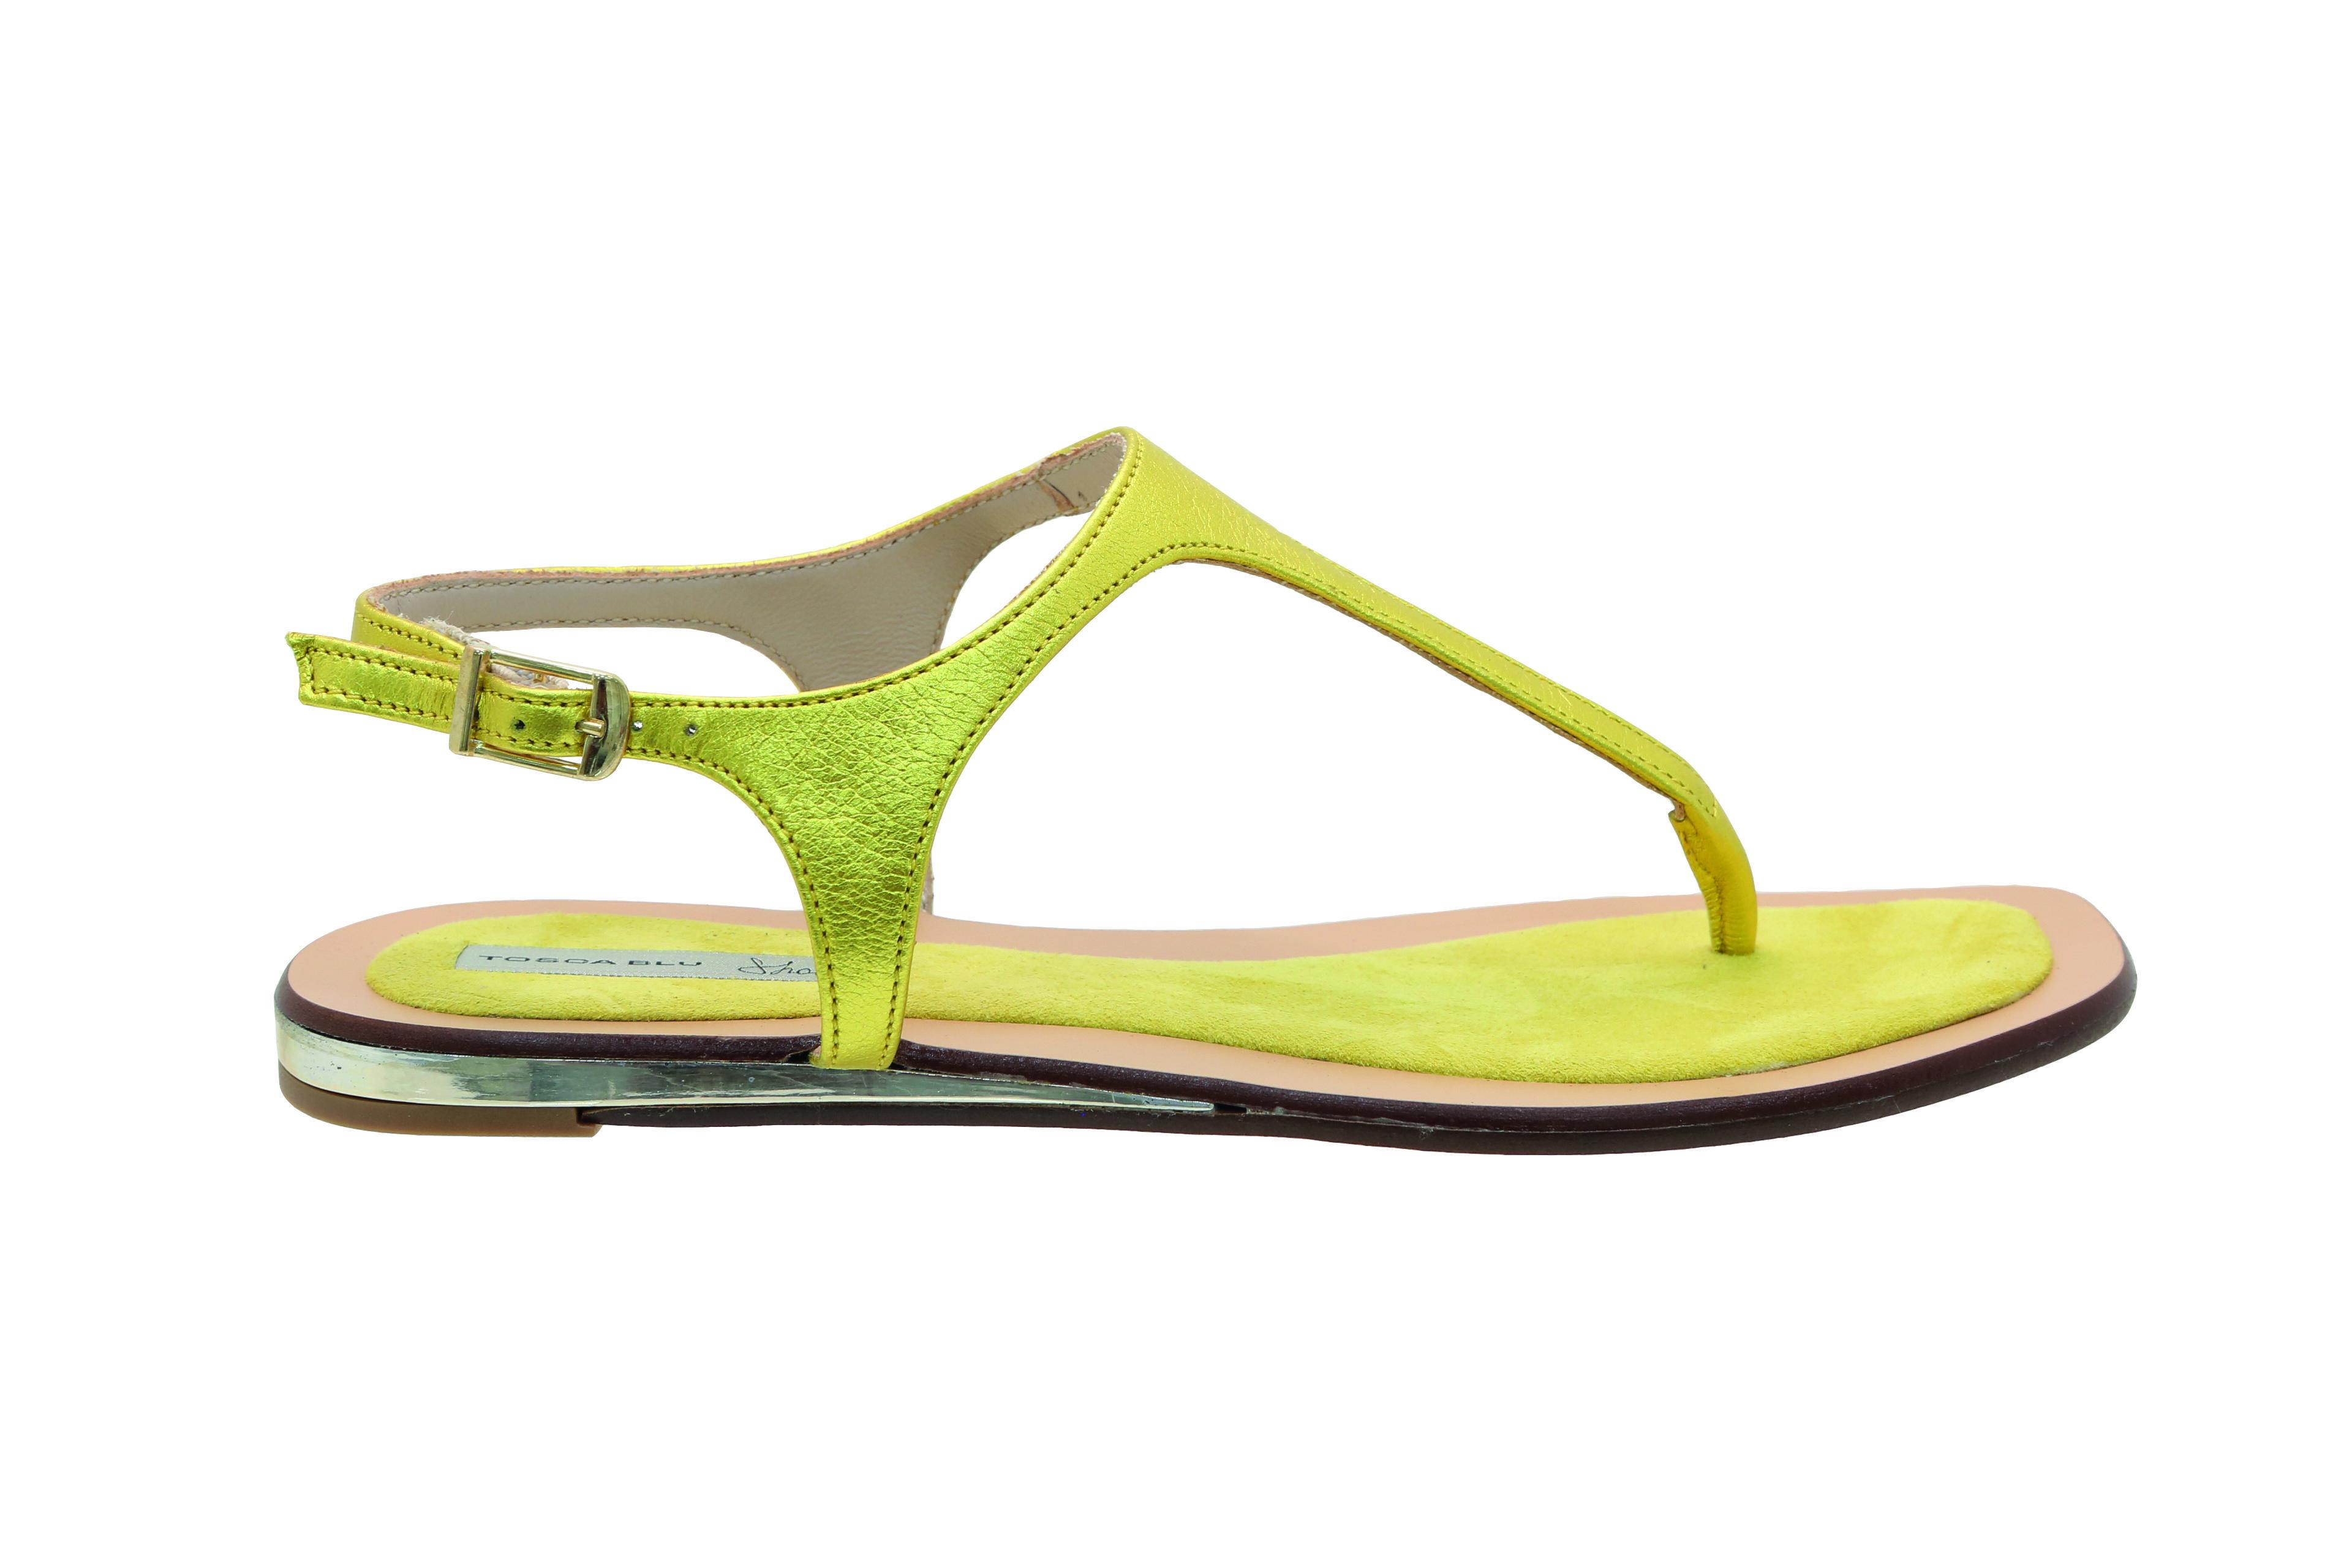 sandalias planas amarillas